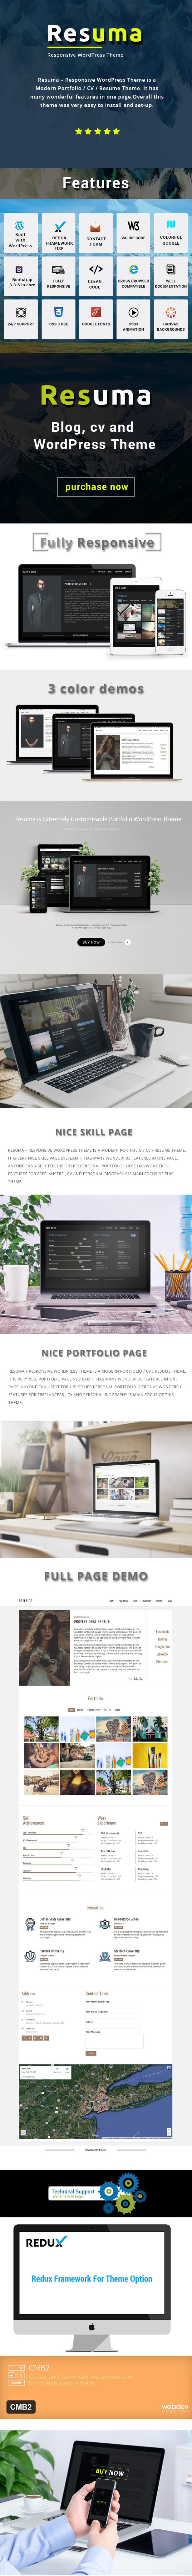 Resuma  - Resume Portfolio Responsive WordPress Theme - 1